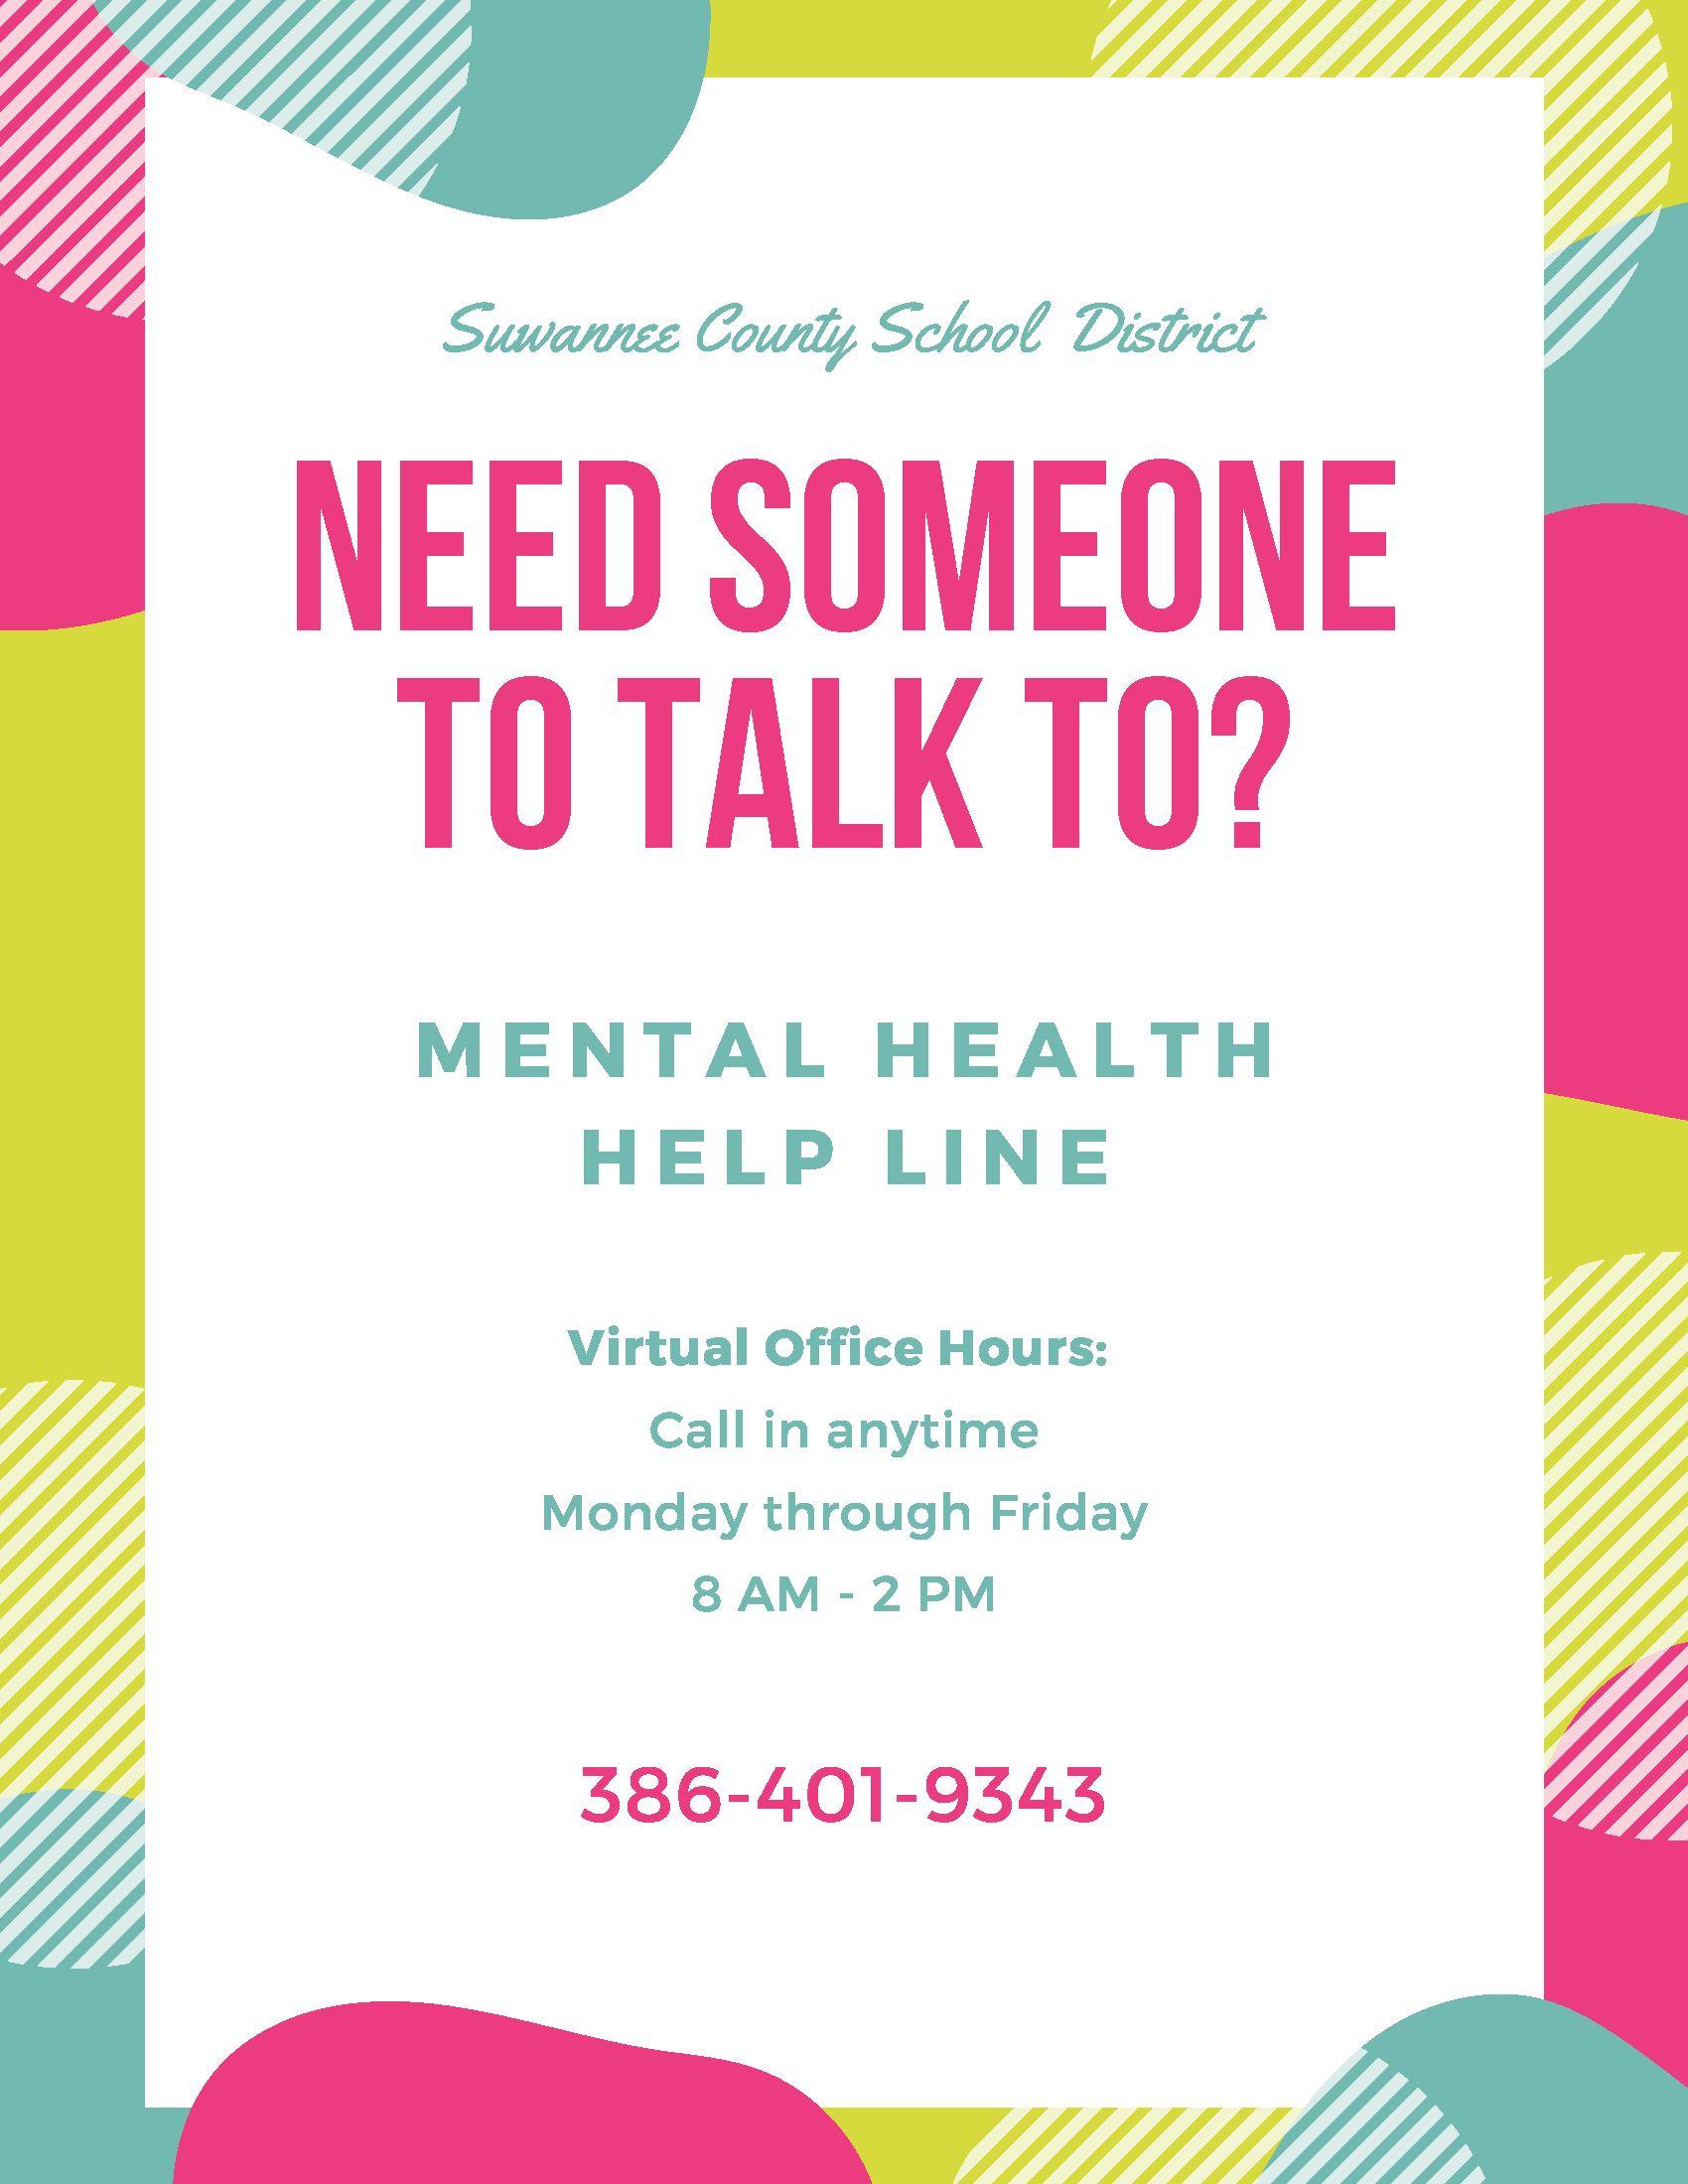 SCSD Mental Health Help Line